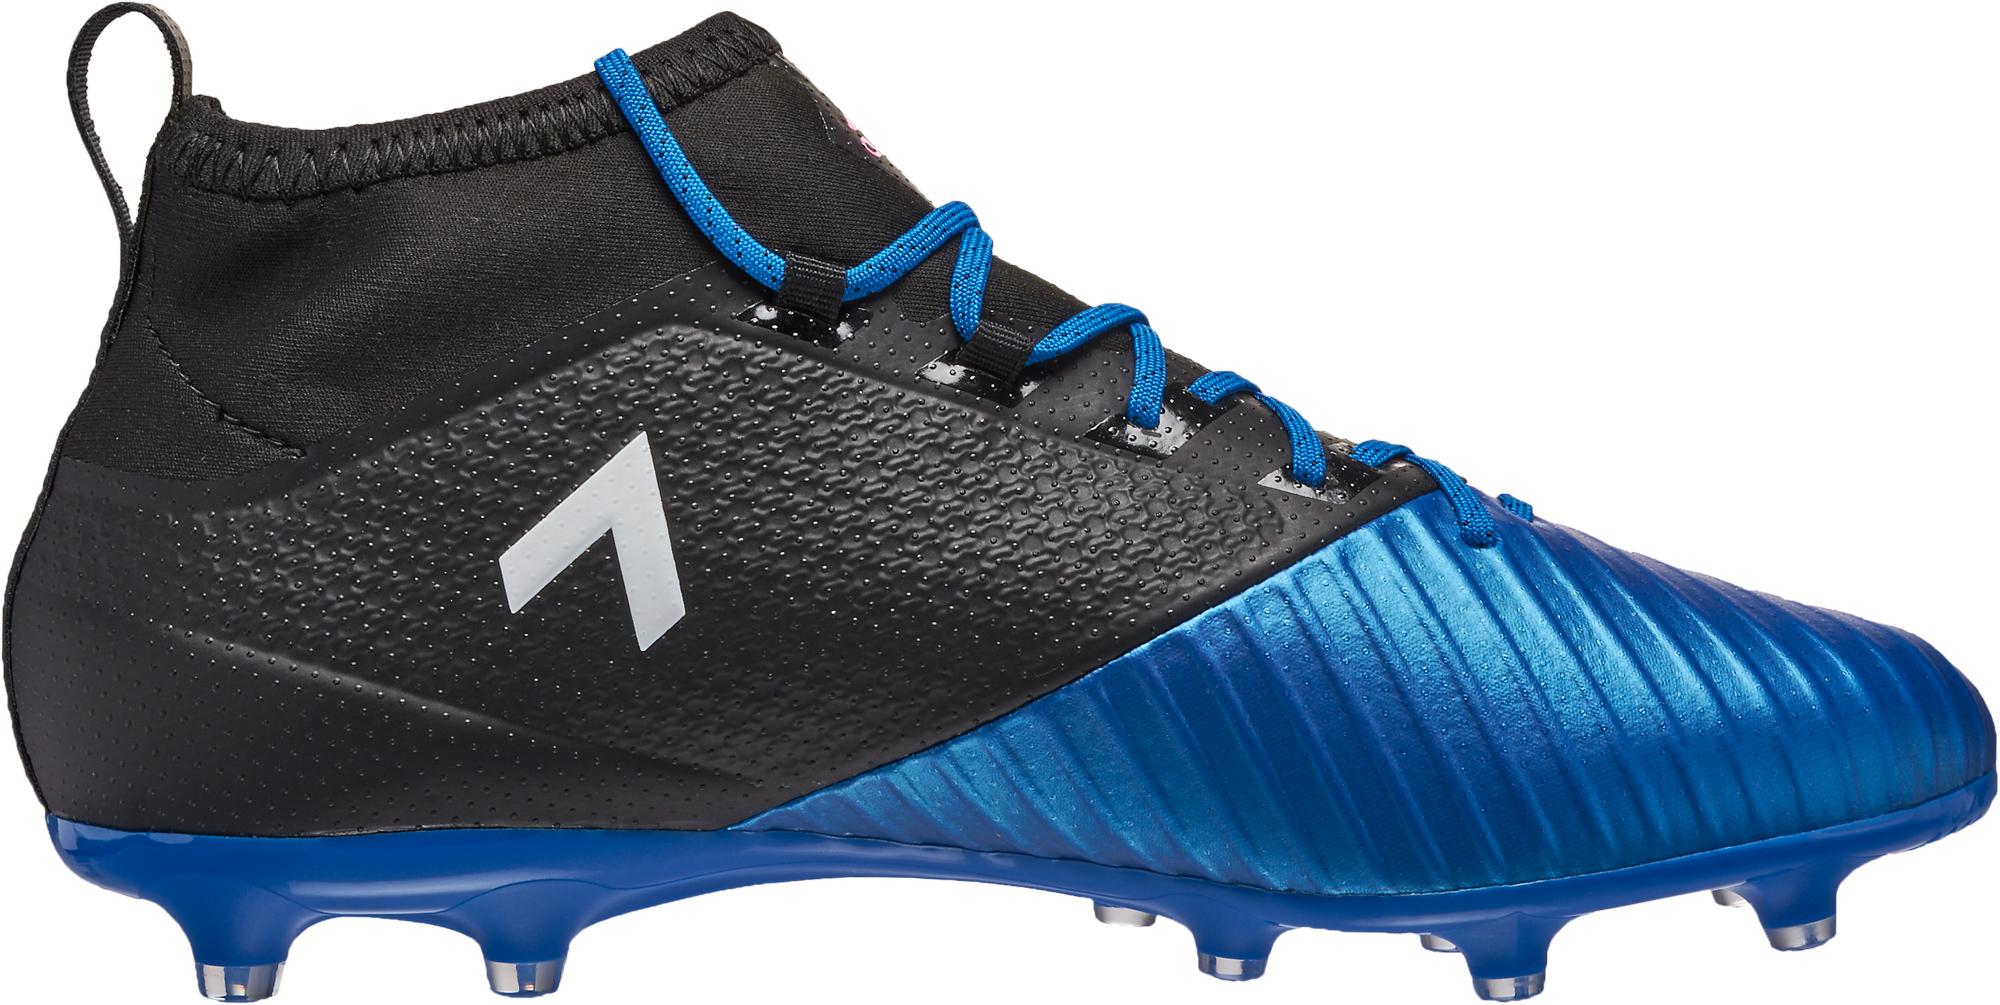 adidas ACE 17.2 Primemesh FG Soccer Cleats - Black f6e2a4cce